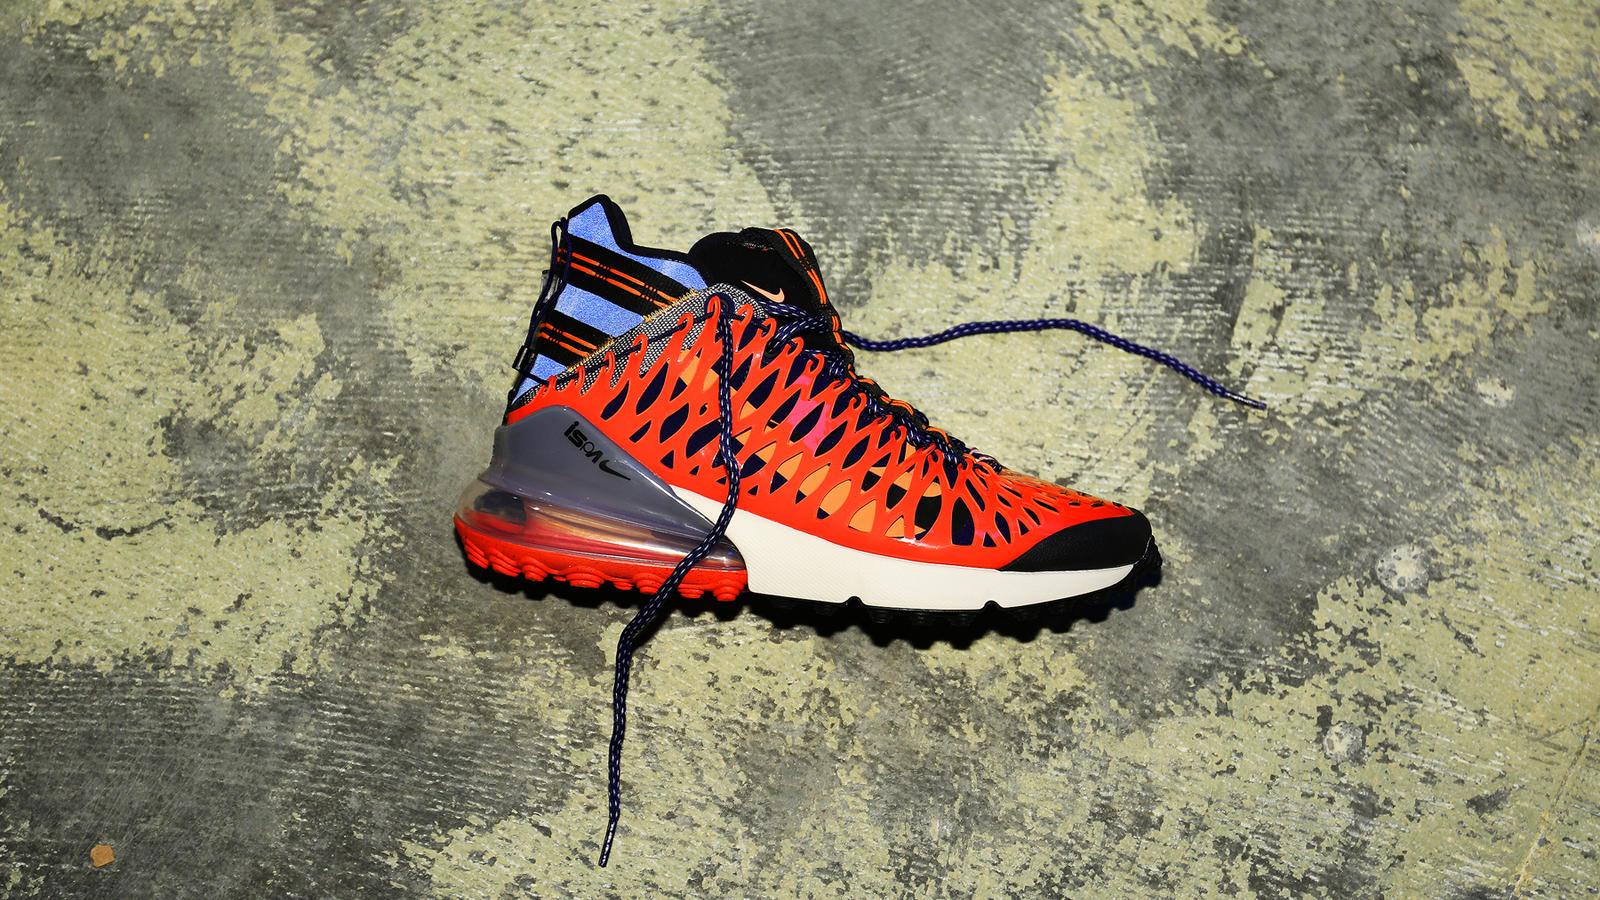 Nike Ispa Air Max 270 Legitimate Pictures three Kenlu Web 8db4b12944af